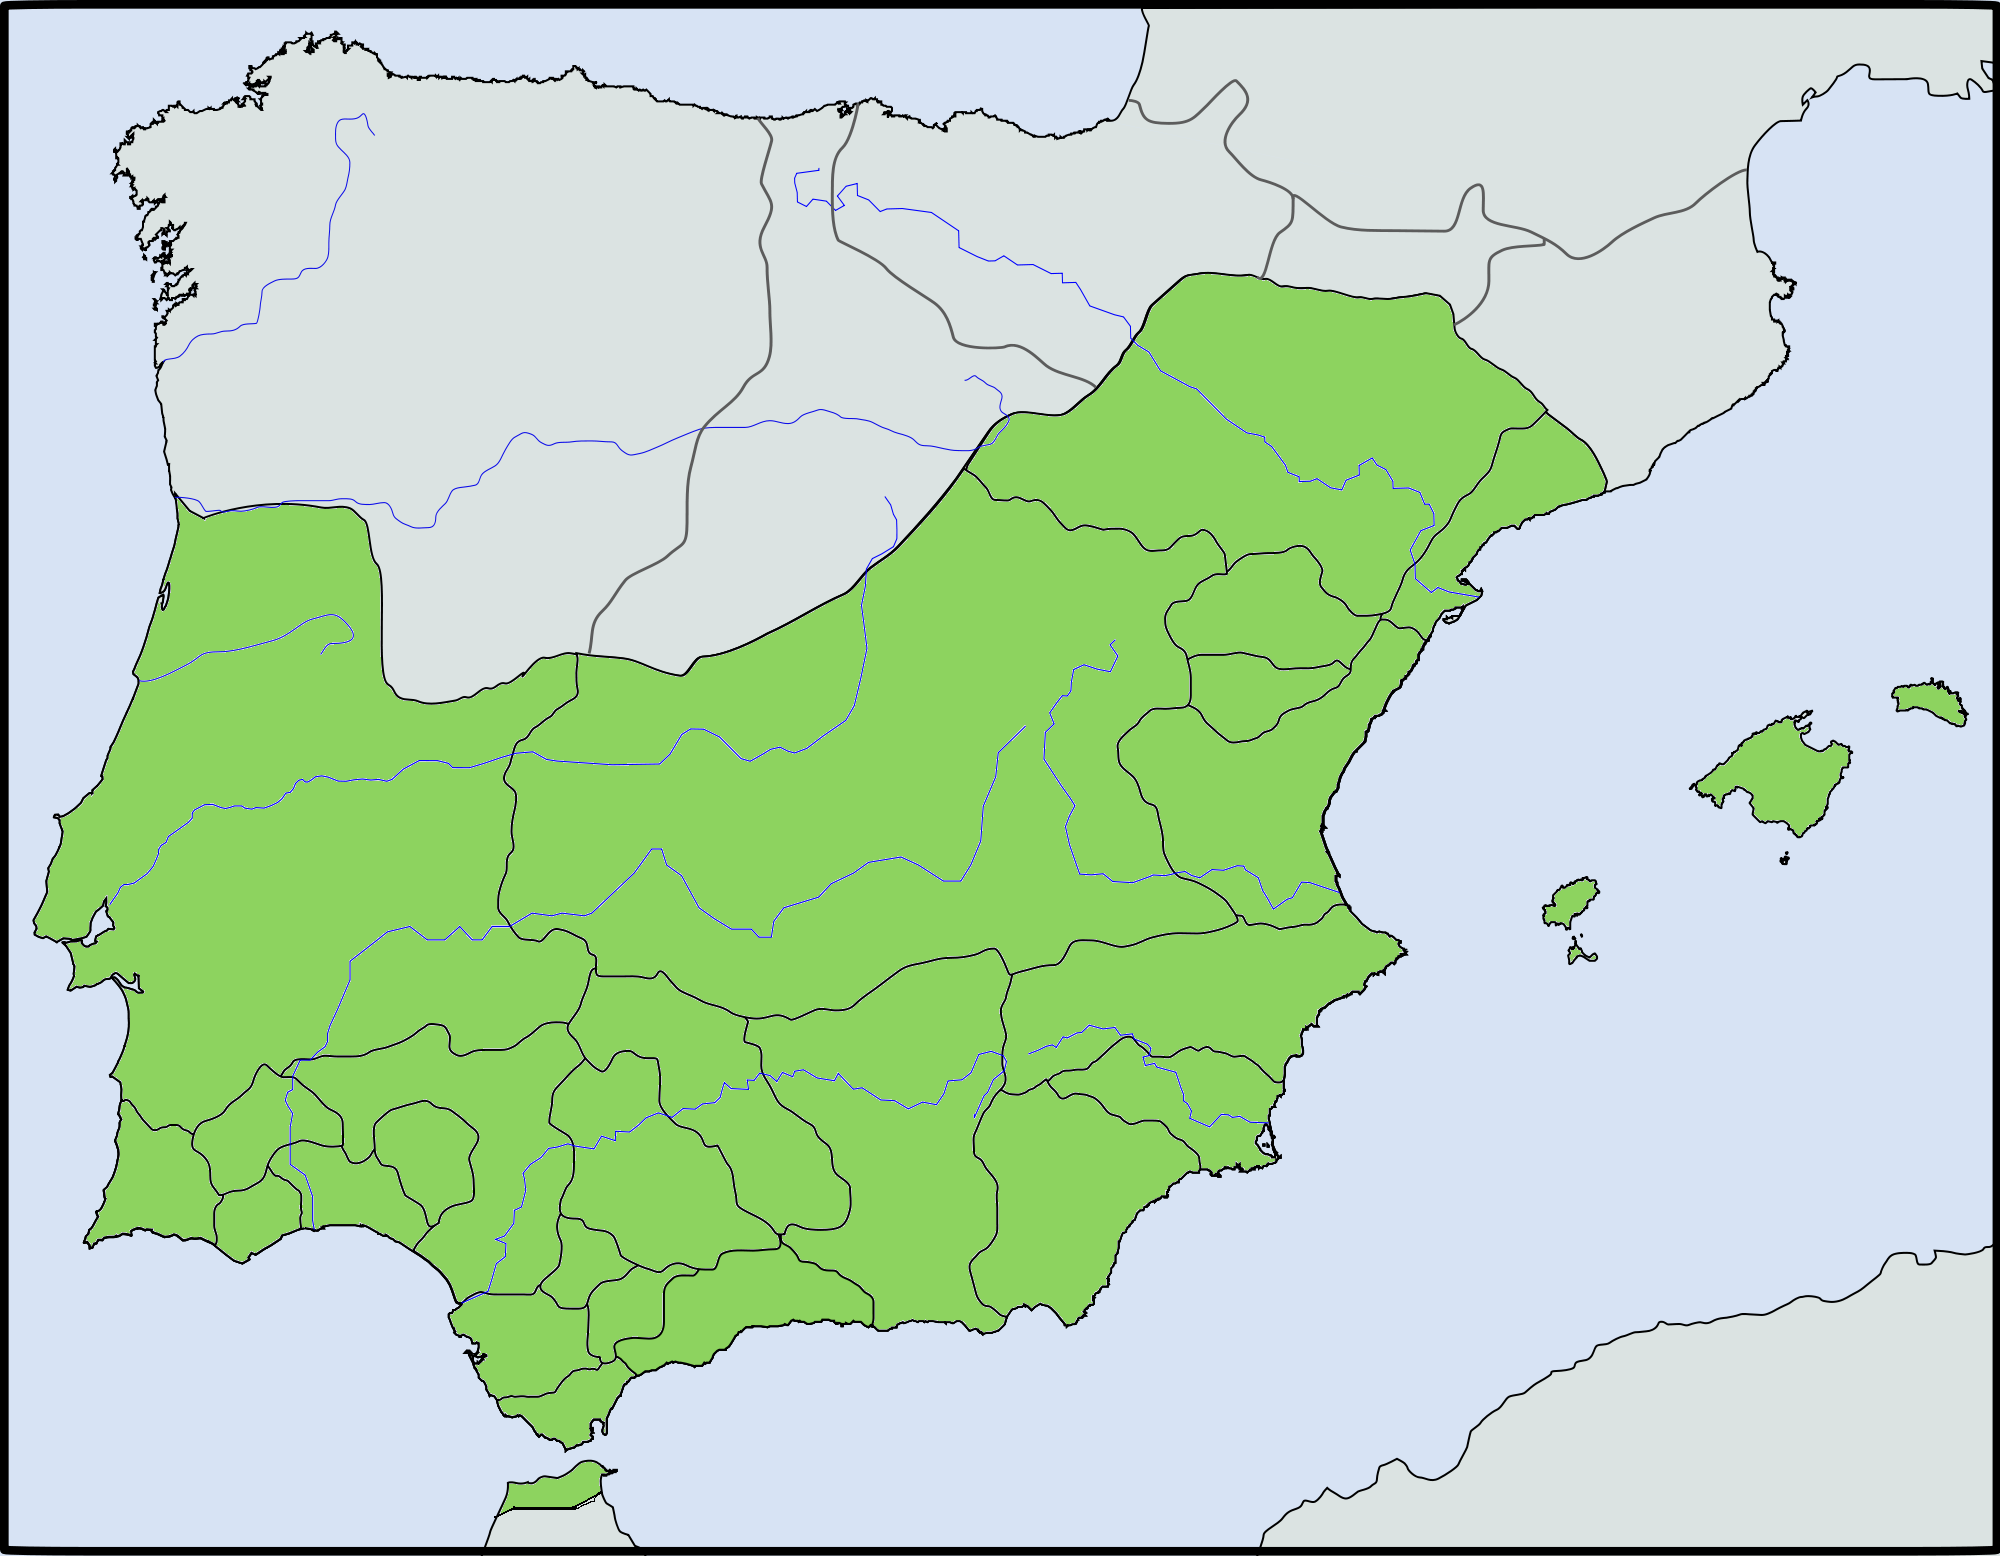 Kingdoms of Wandalus (Without Islam)